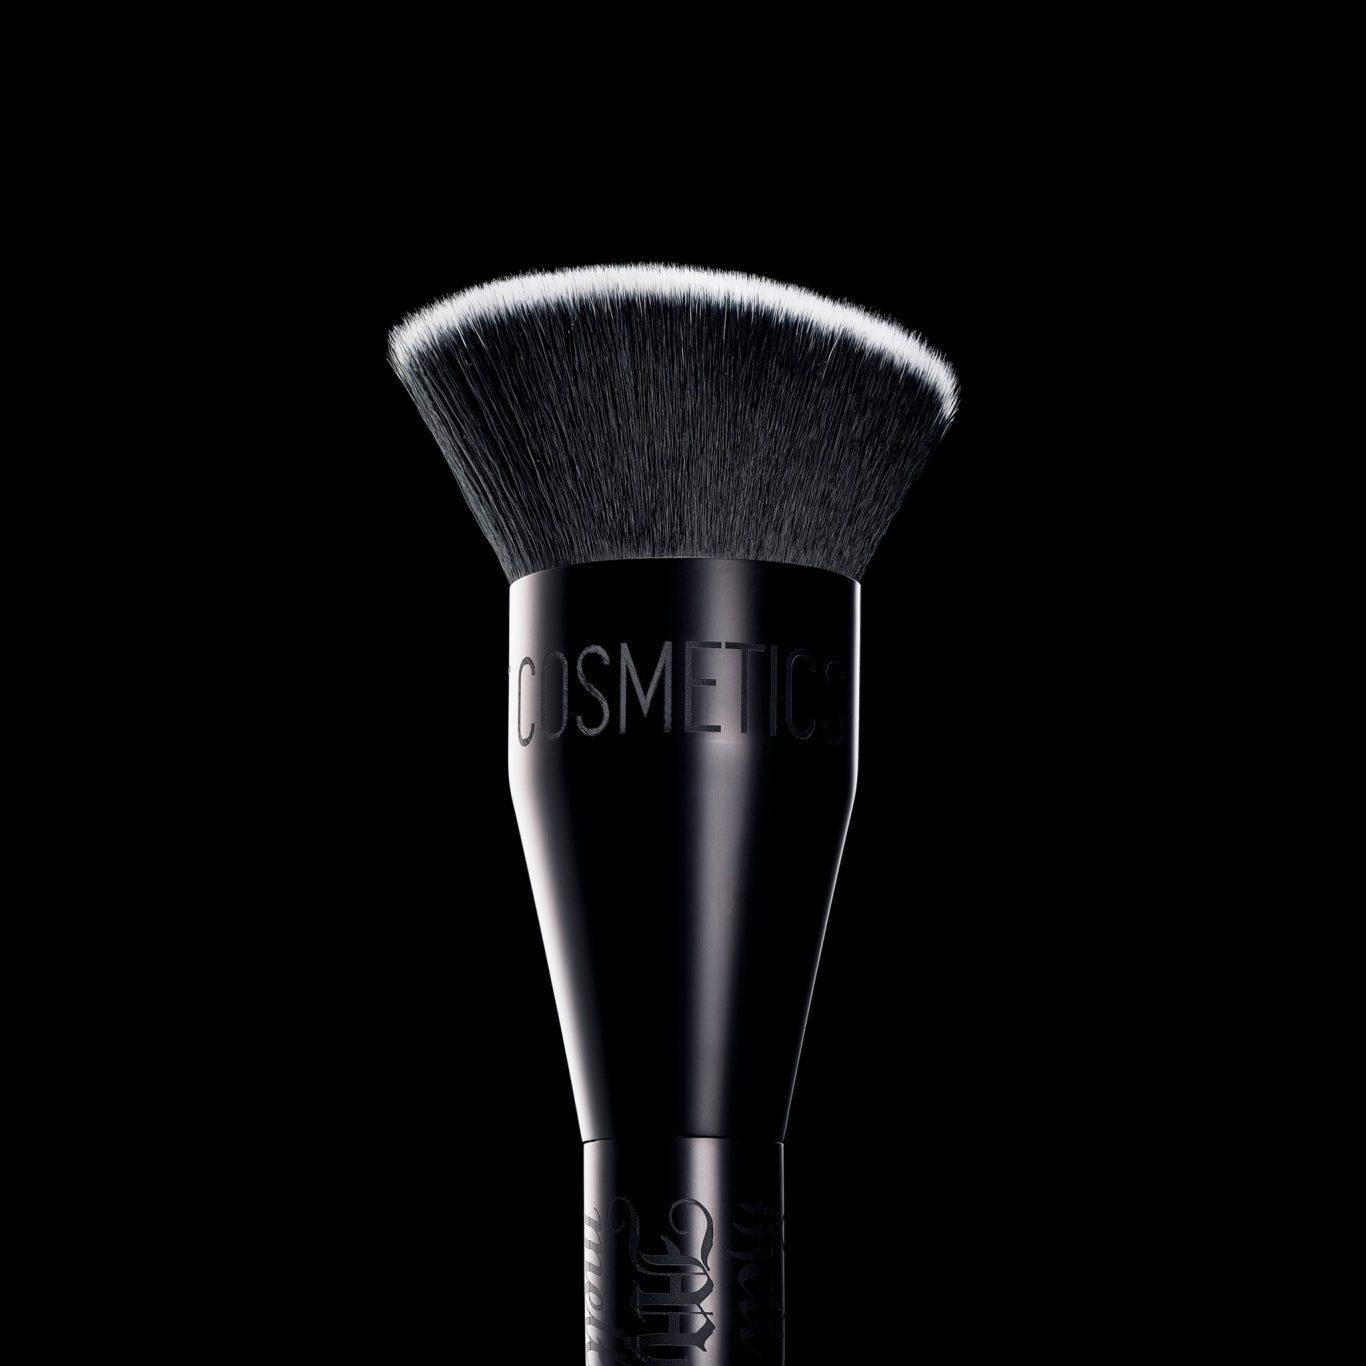 Melt Cosmetics SexFoil Digital Liquid Highlights 900 Face & Body Brush Promo